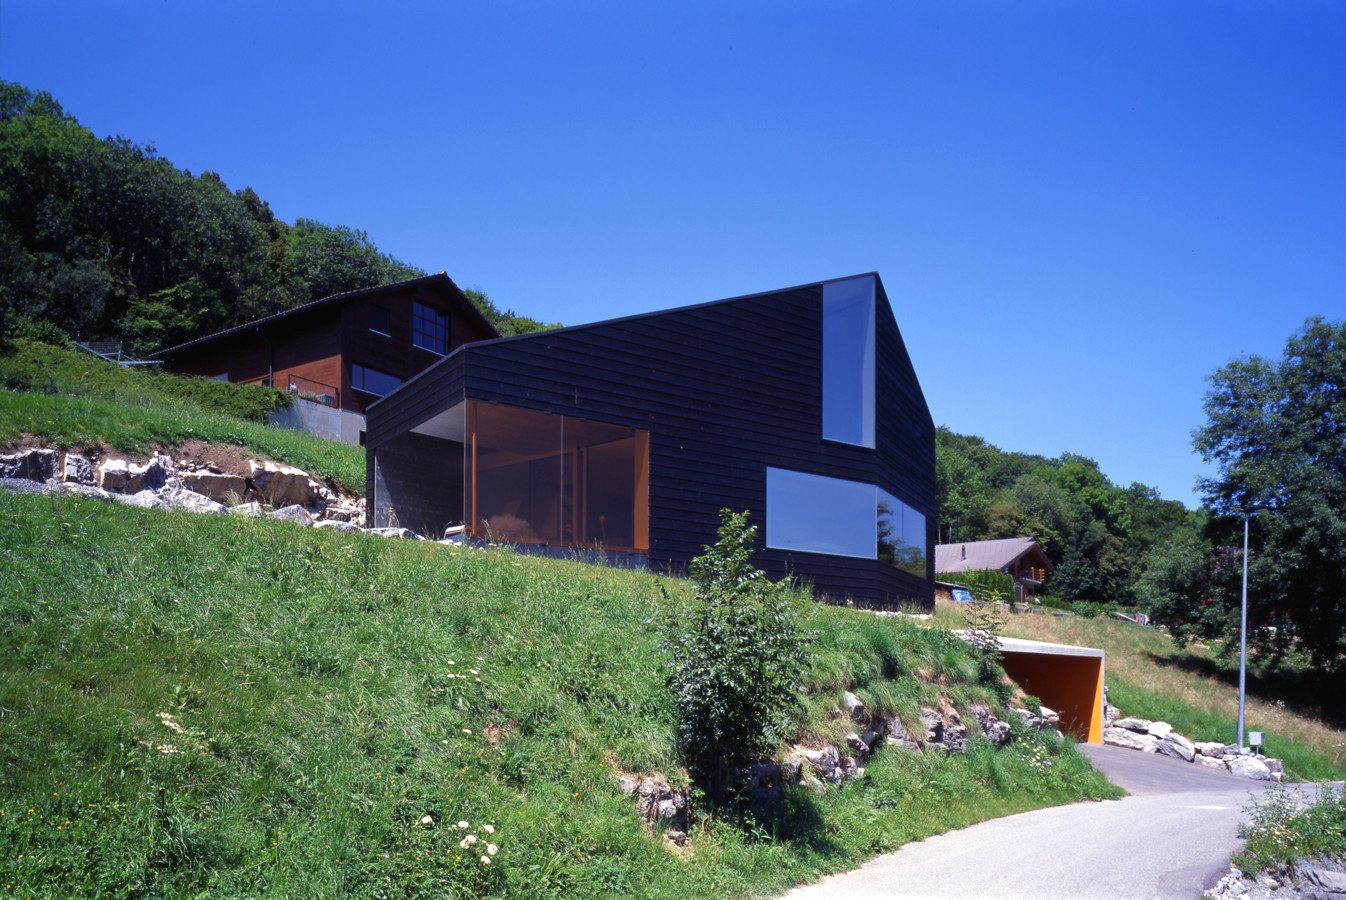 Martinho Les Neyres Residence / Bonnard Woeffray Architectes, © Hannes Henz